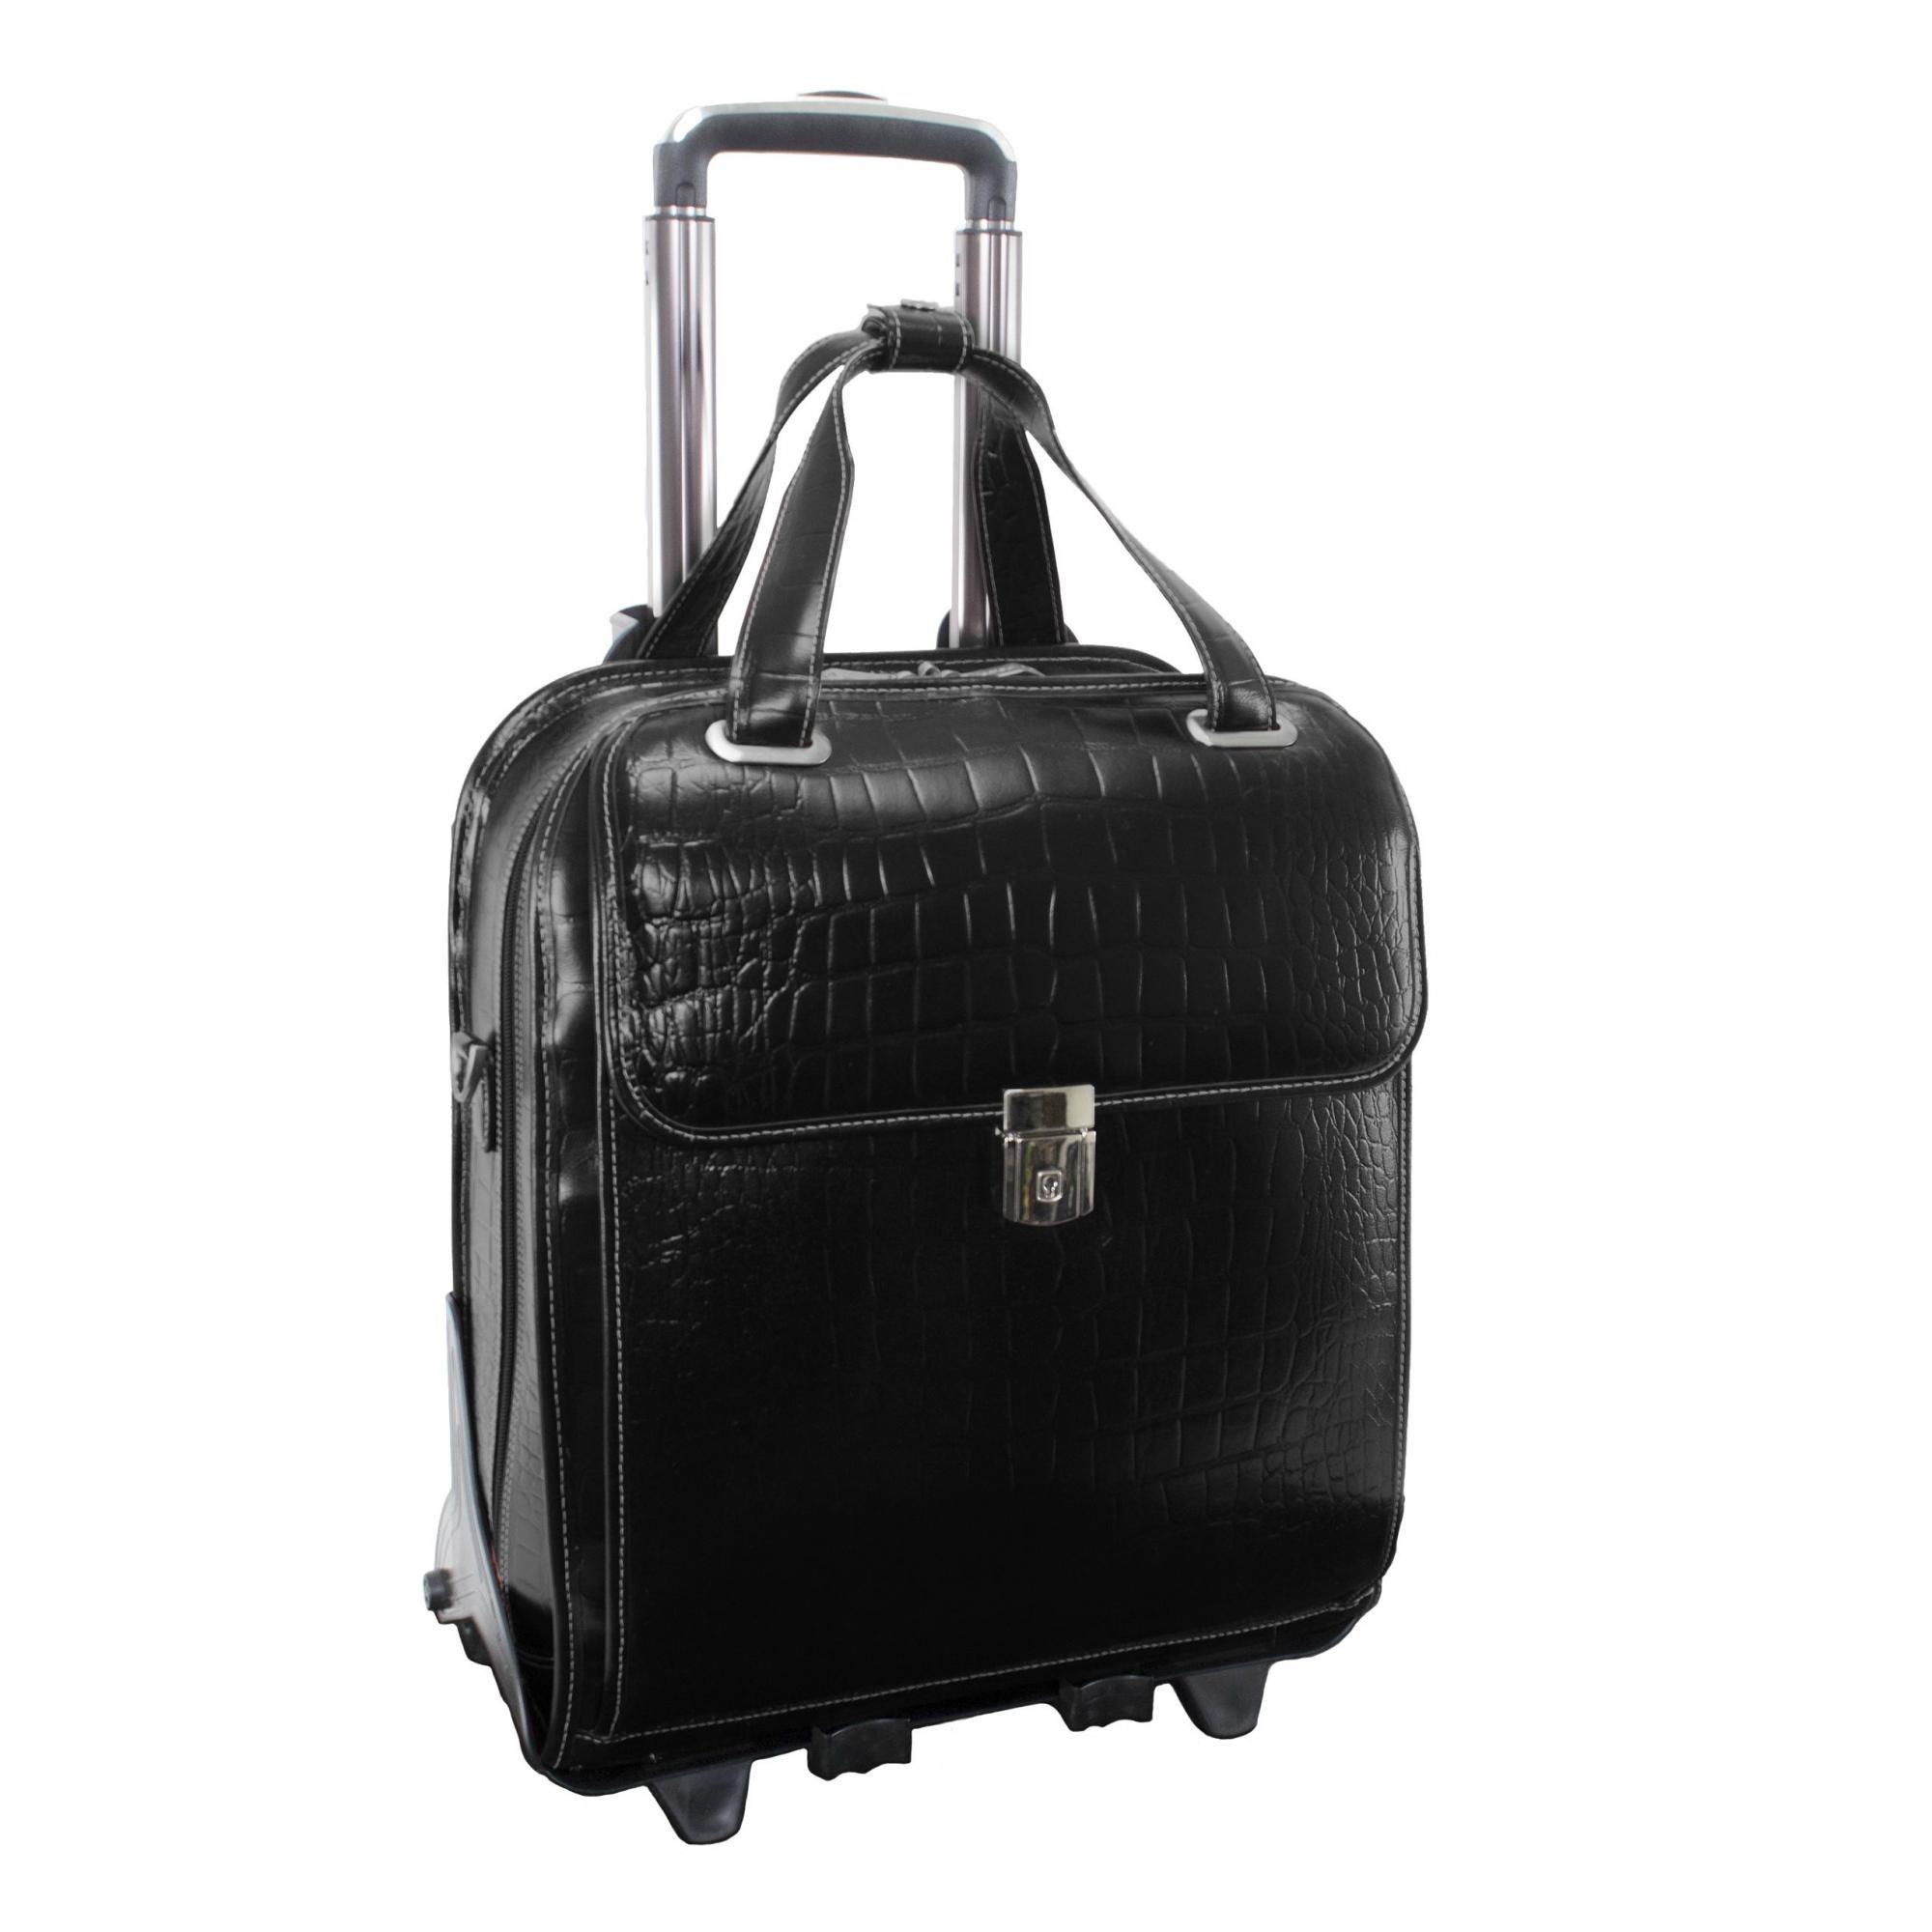 Siamod NOVEMBRE 35325 Black Leather Ladies' Detachable-Wheeled Laptop Case